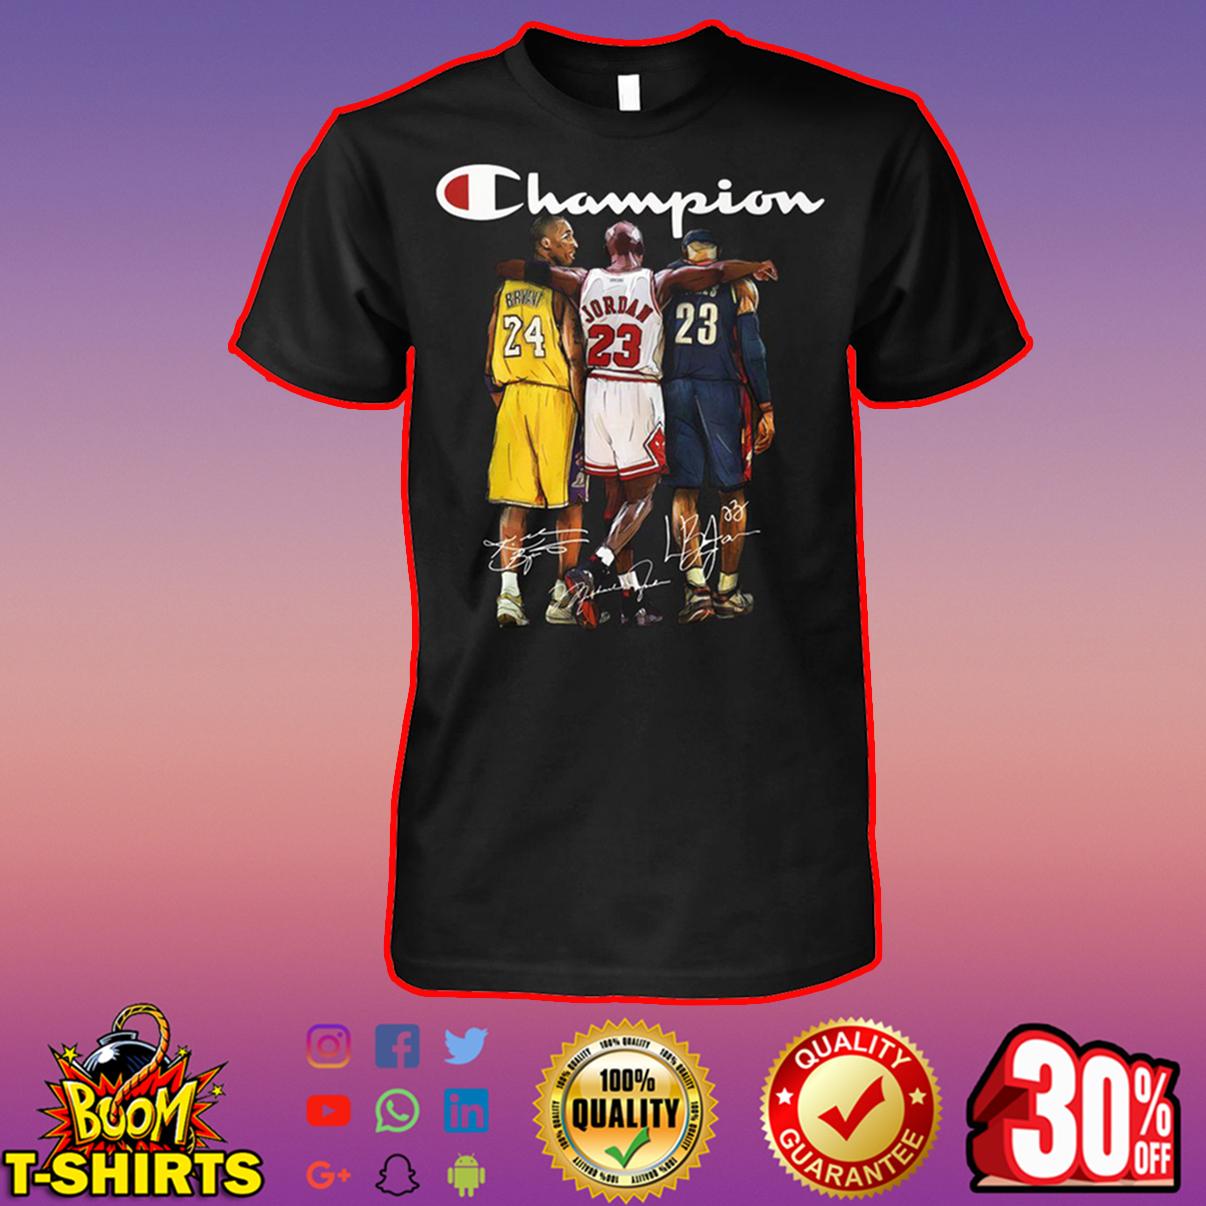 Bryant Jordan LeBron James champion signature shirt